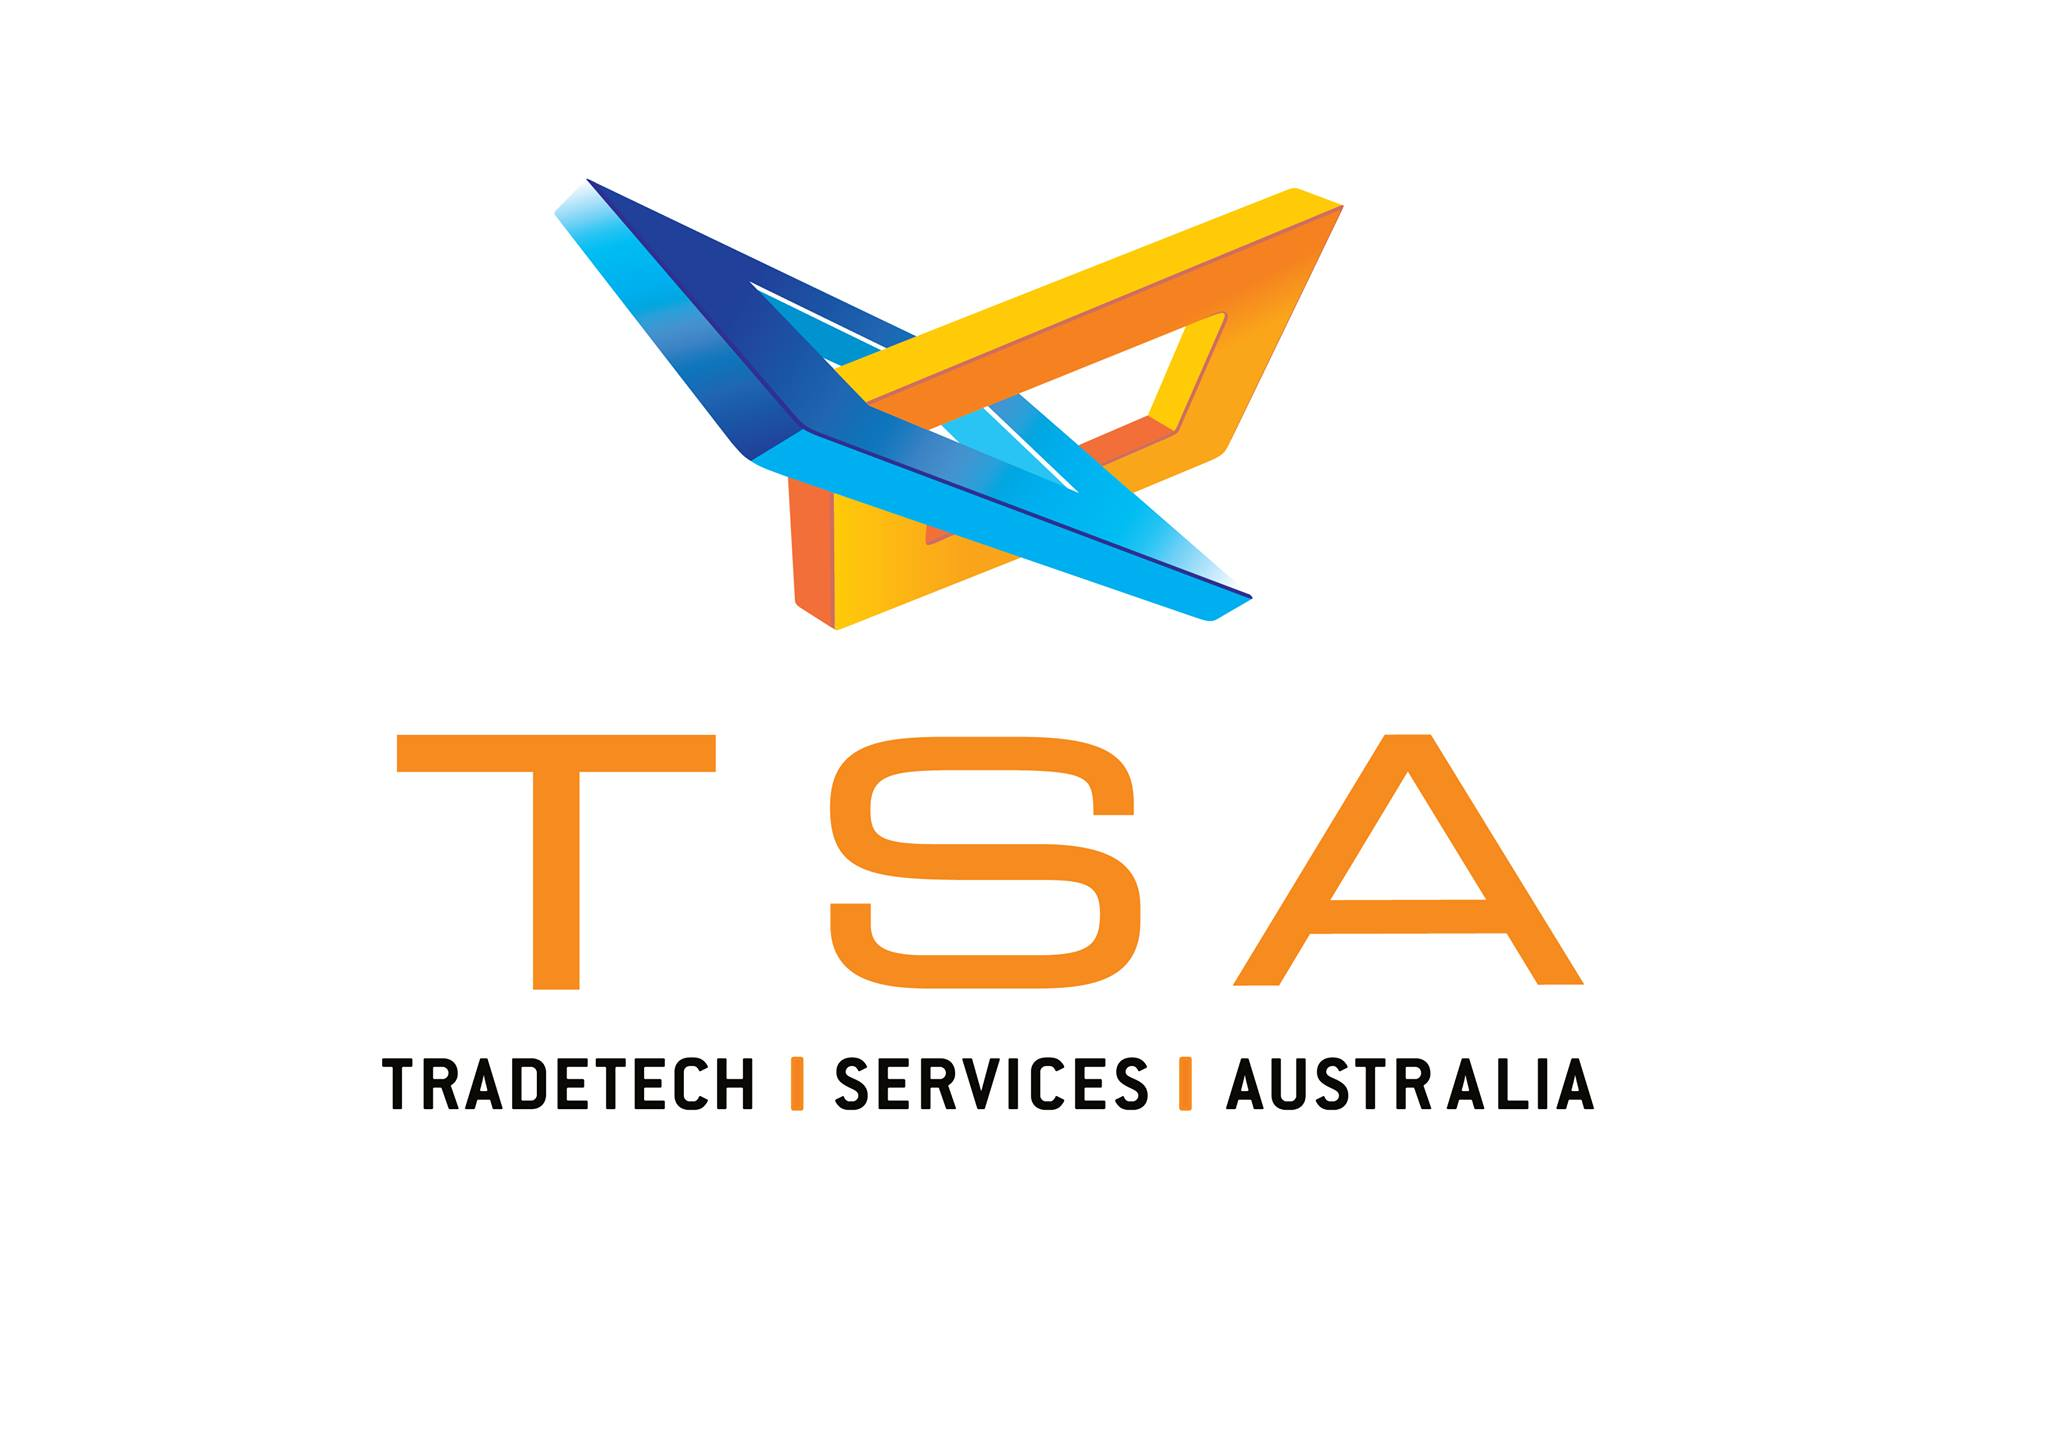 Tradetech Services Australia